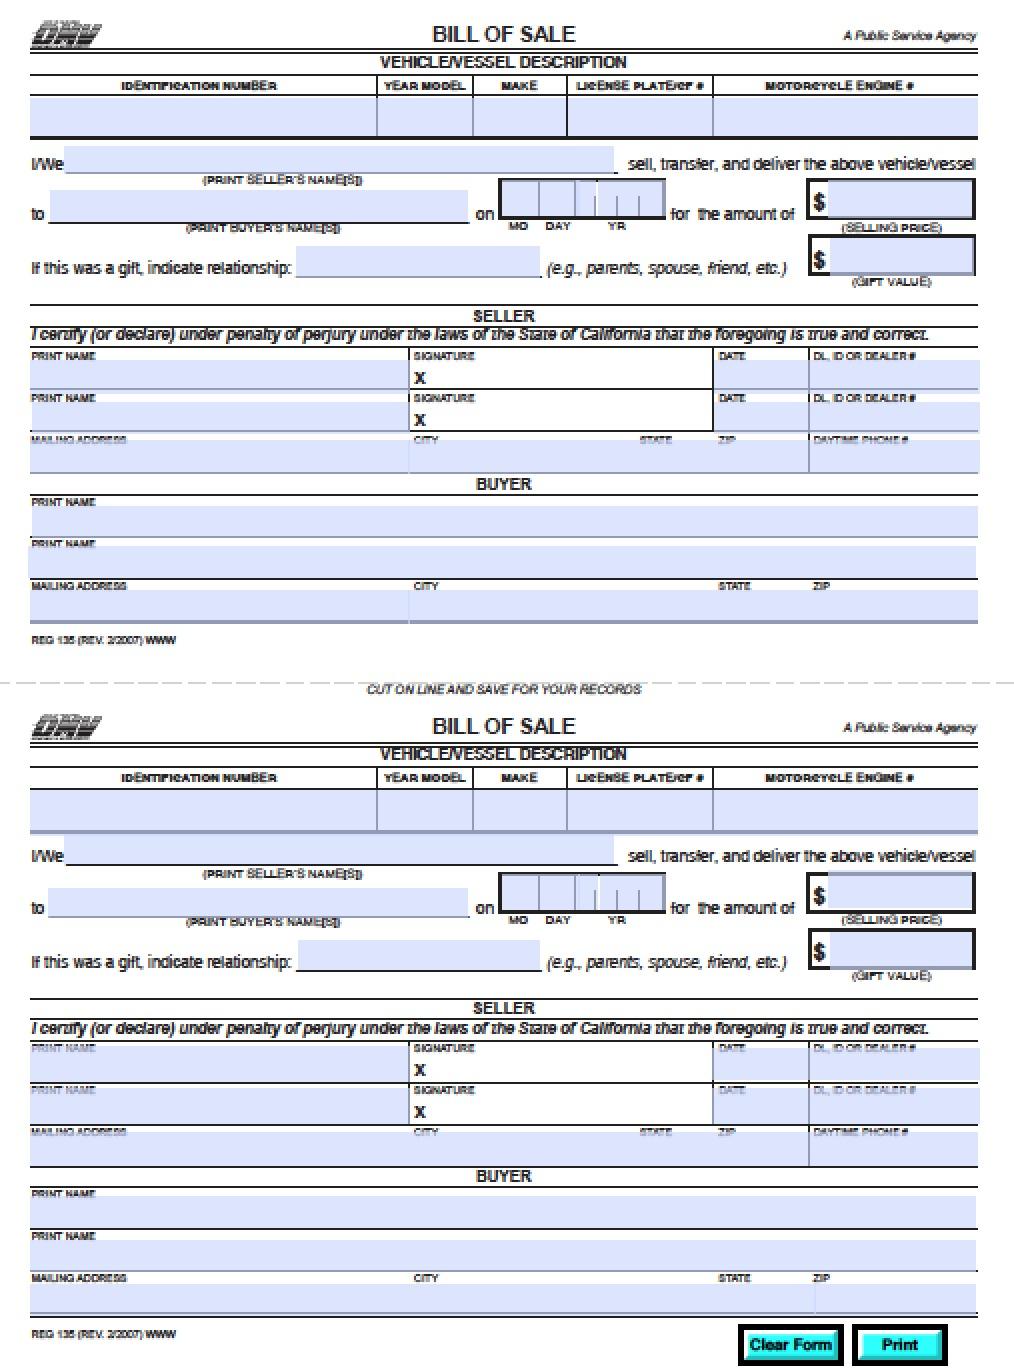 Free California DMV Bill of Sale (REG 135)   Vehicle   Boat Form   PDF